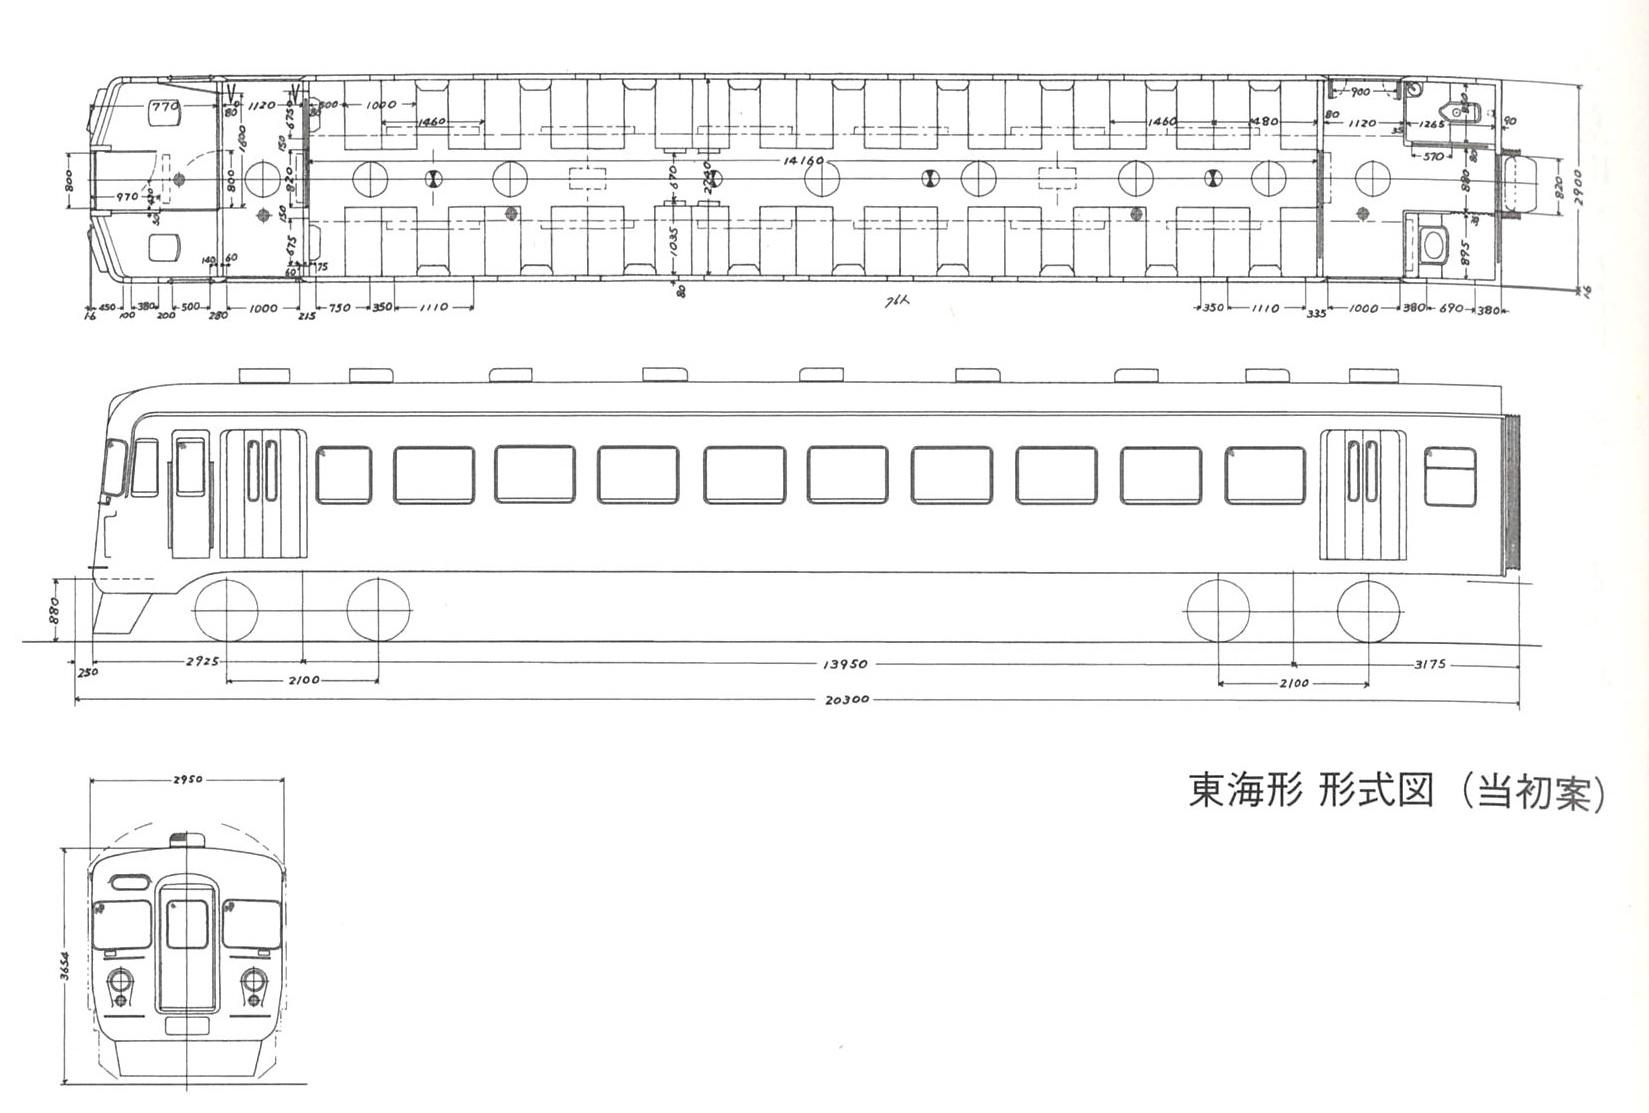 クハ153 0番台(当初案)